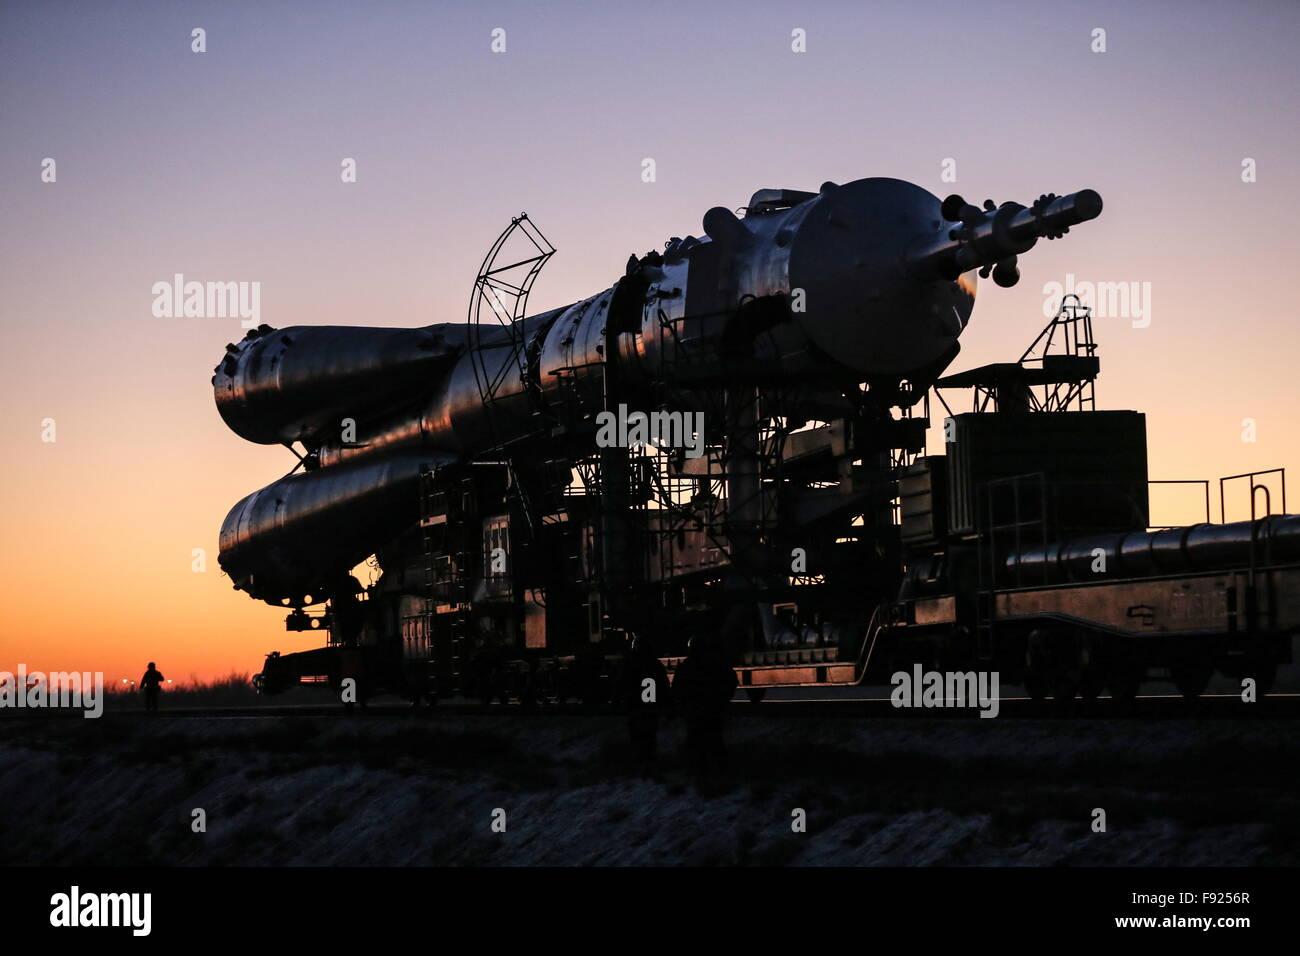 Baikonur, Kazakhstan. 13th Dec, 2015. A Soyuz FG rocket booster with the Soyuz TMA-19M spacecraft being transported - Stock Image